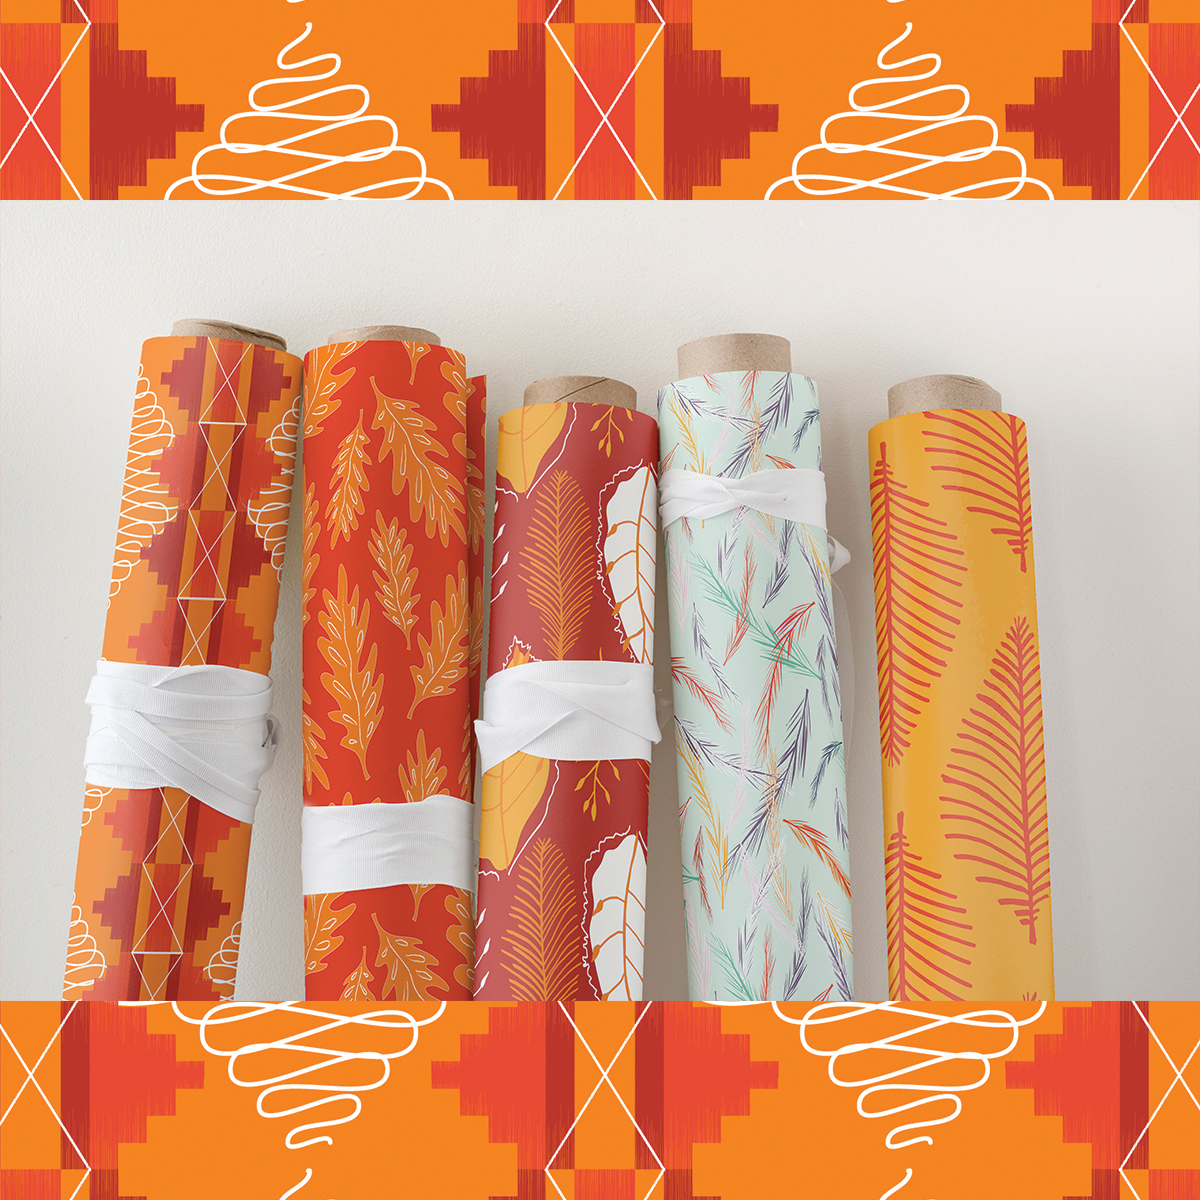 NJ_Fabric Rolls Mock_Fruity Tones_1200 pix_72 dpi.jpg